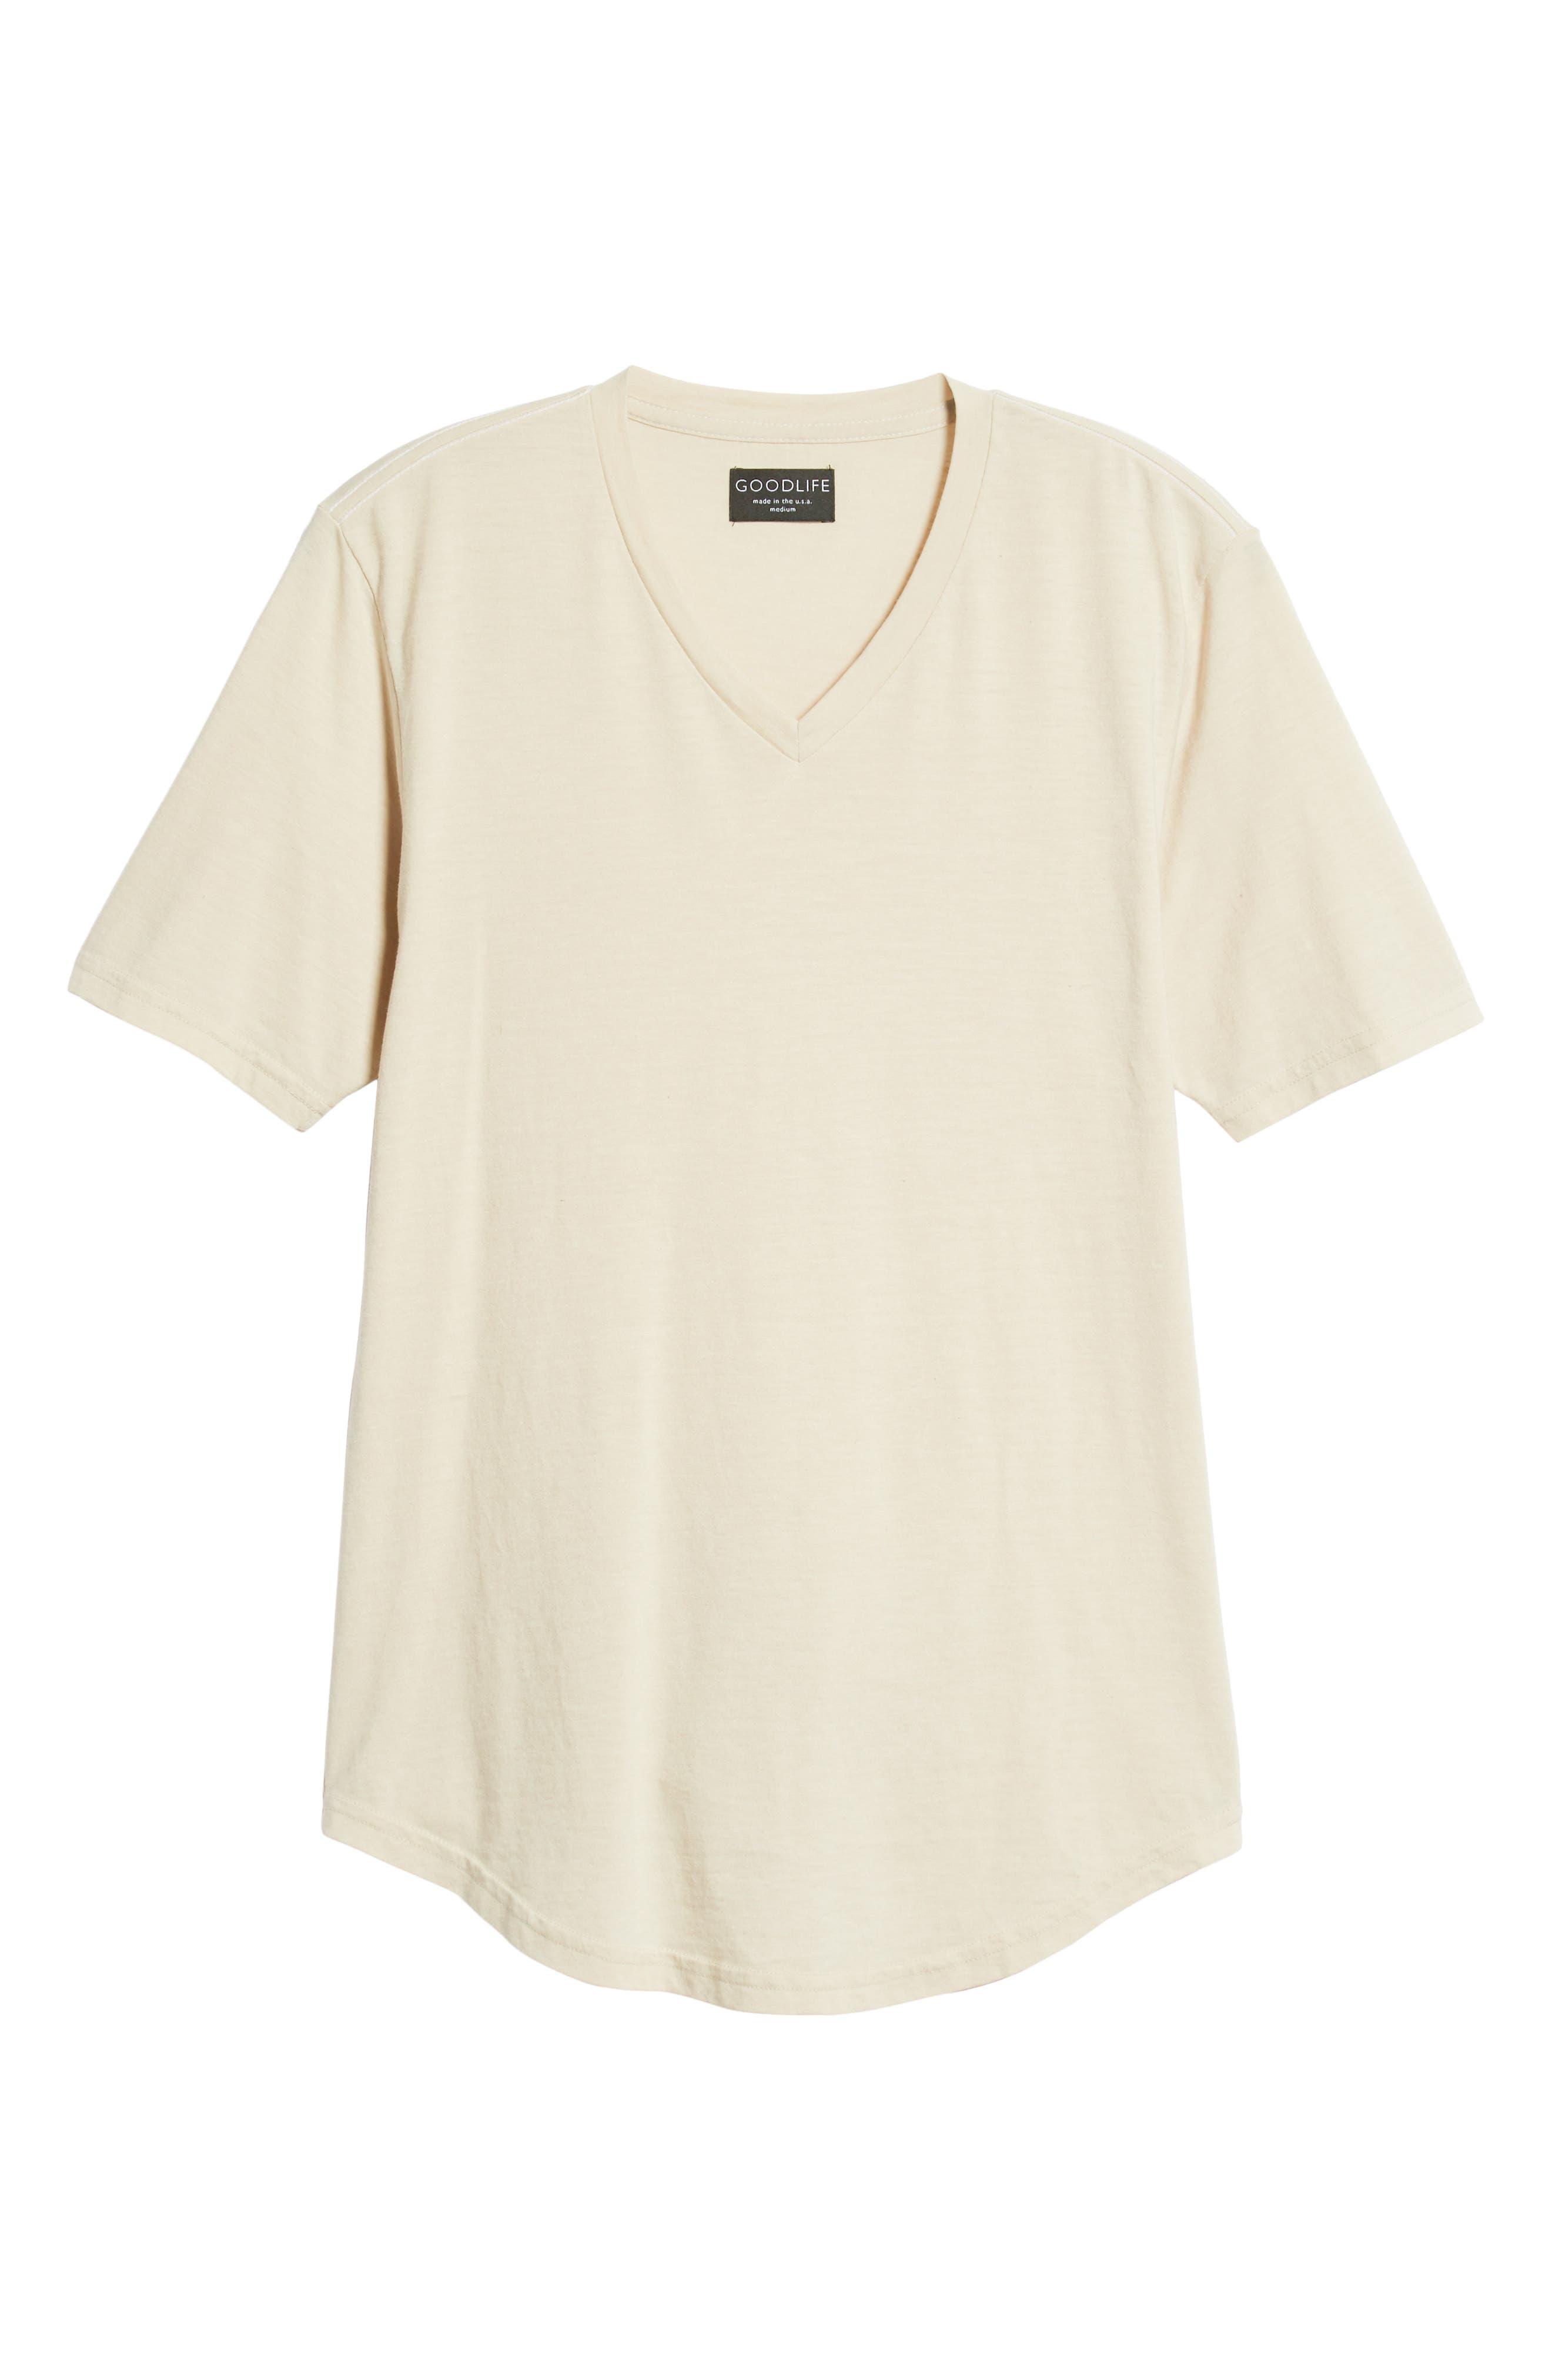 Scallop Triblend V-Neck T-Shirt,                             Alternate thumbnail 6, color,                             OYSTER